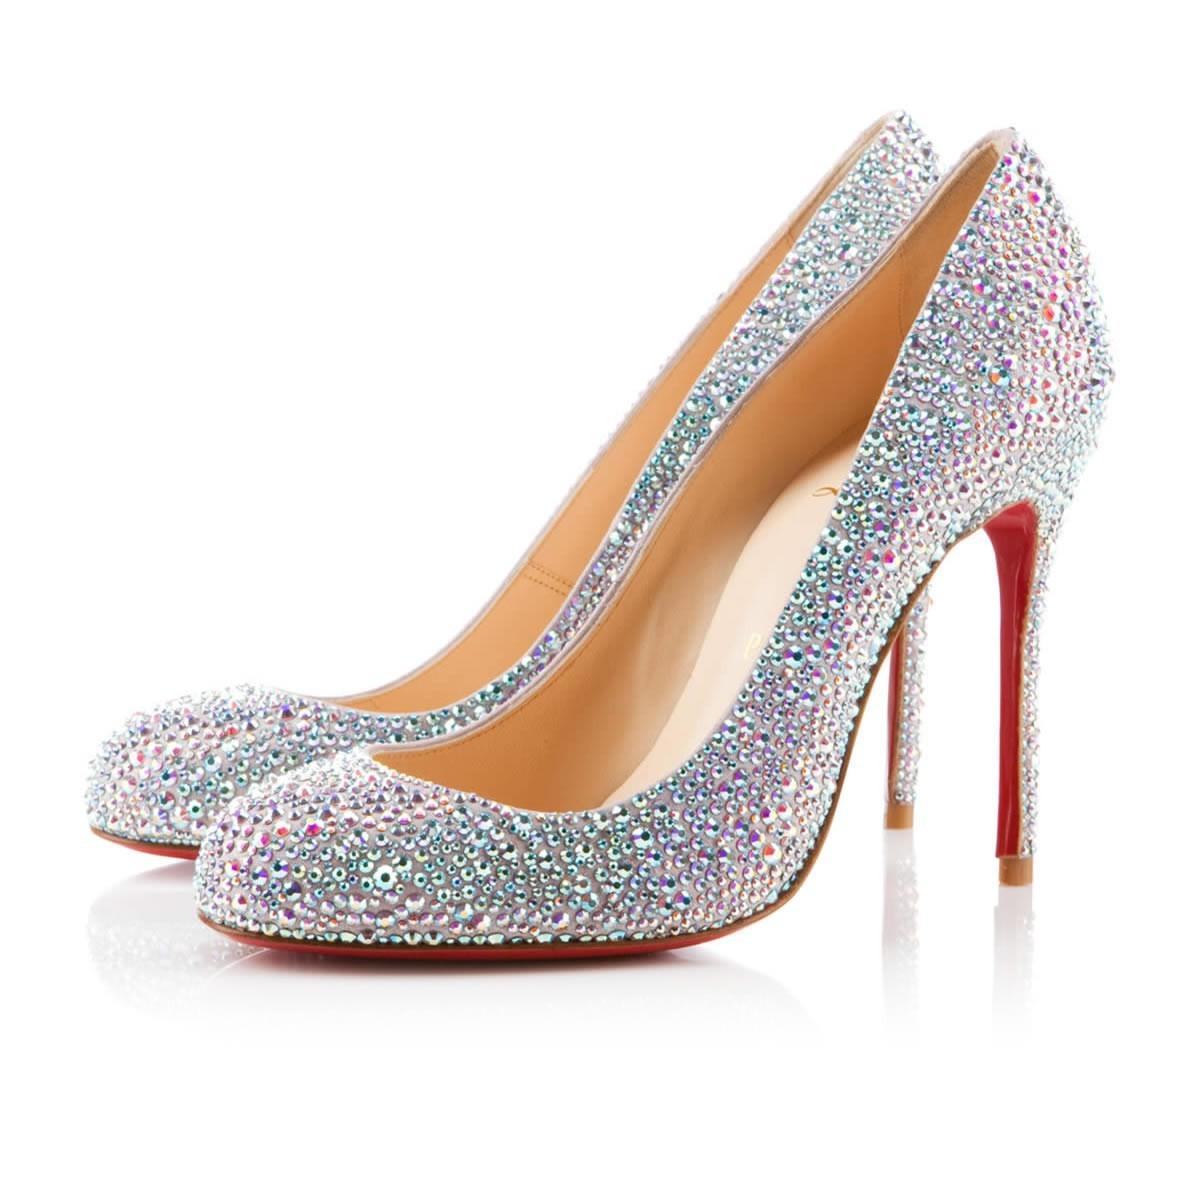 Christian Louboutin heels white glitter pump